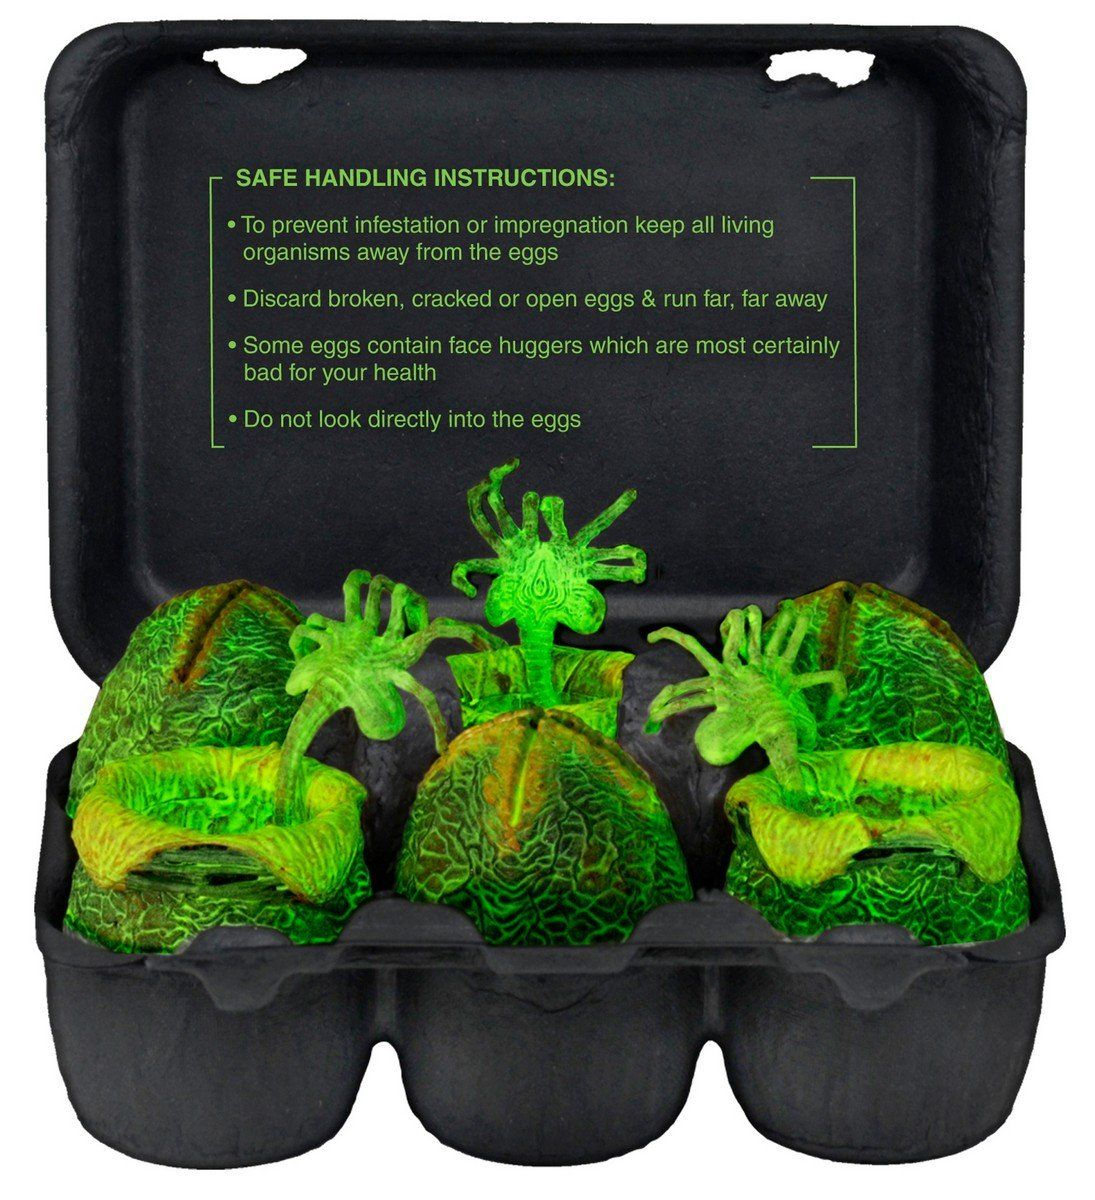 6 Pack NECA Alien Egg Carton Glow-in-the-Dark Alien Eggs Accessory Pack